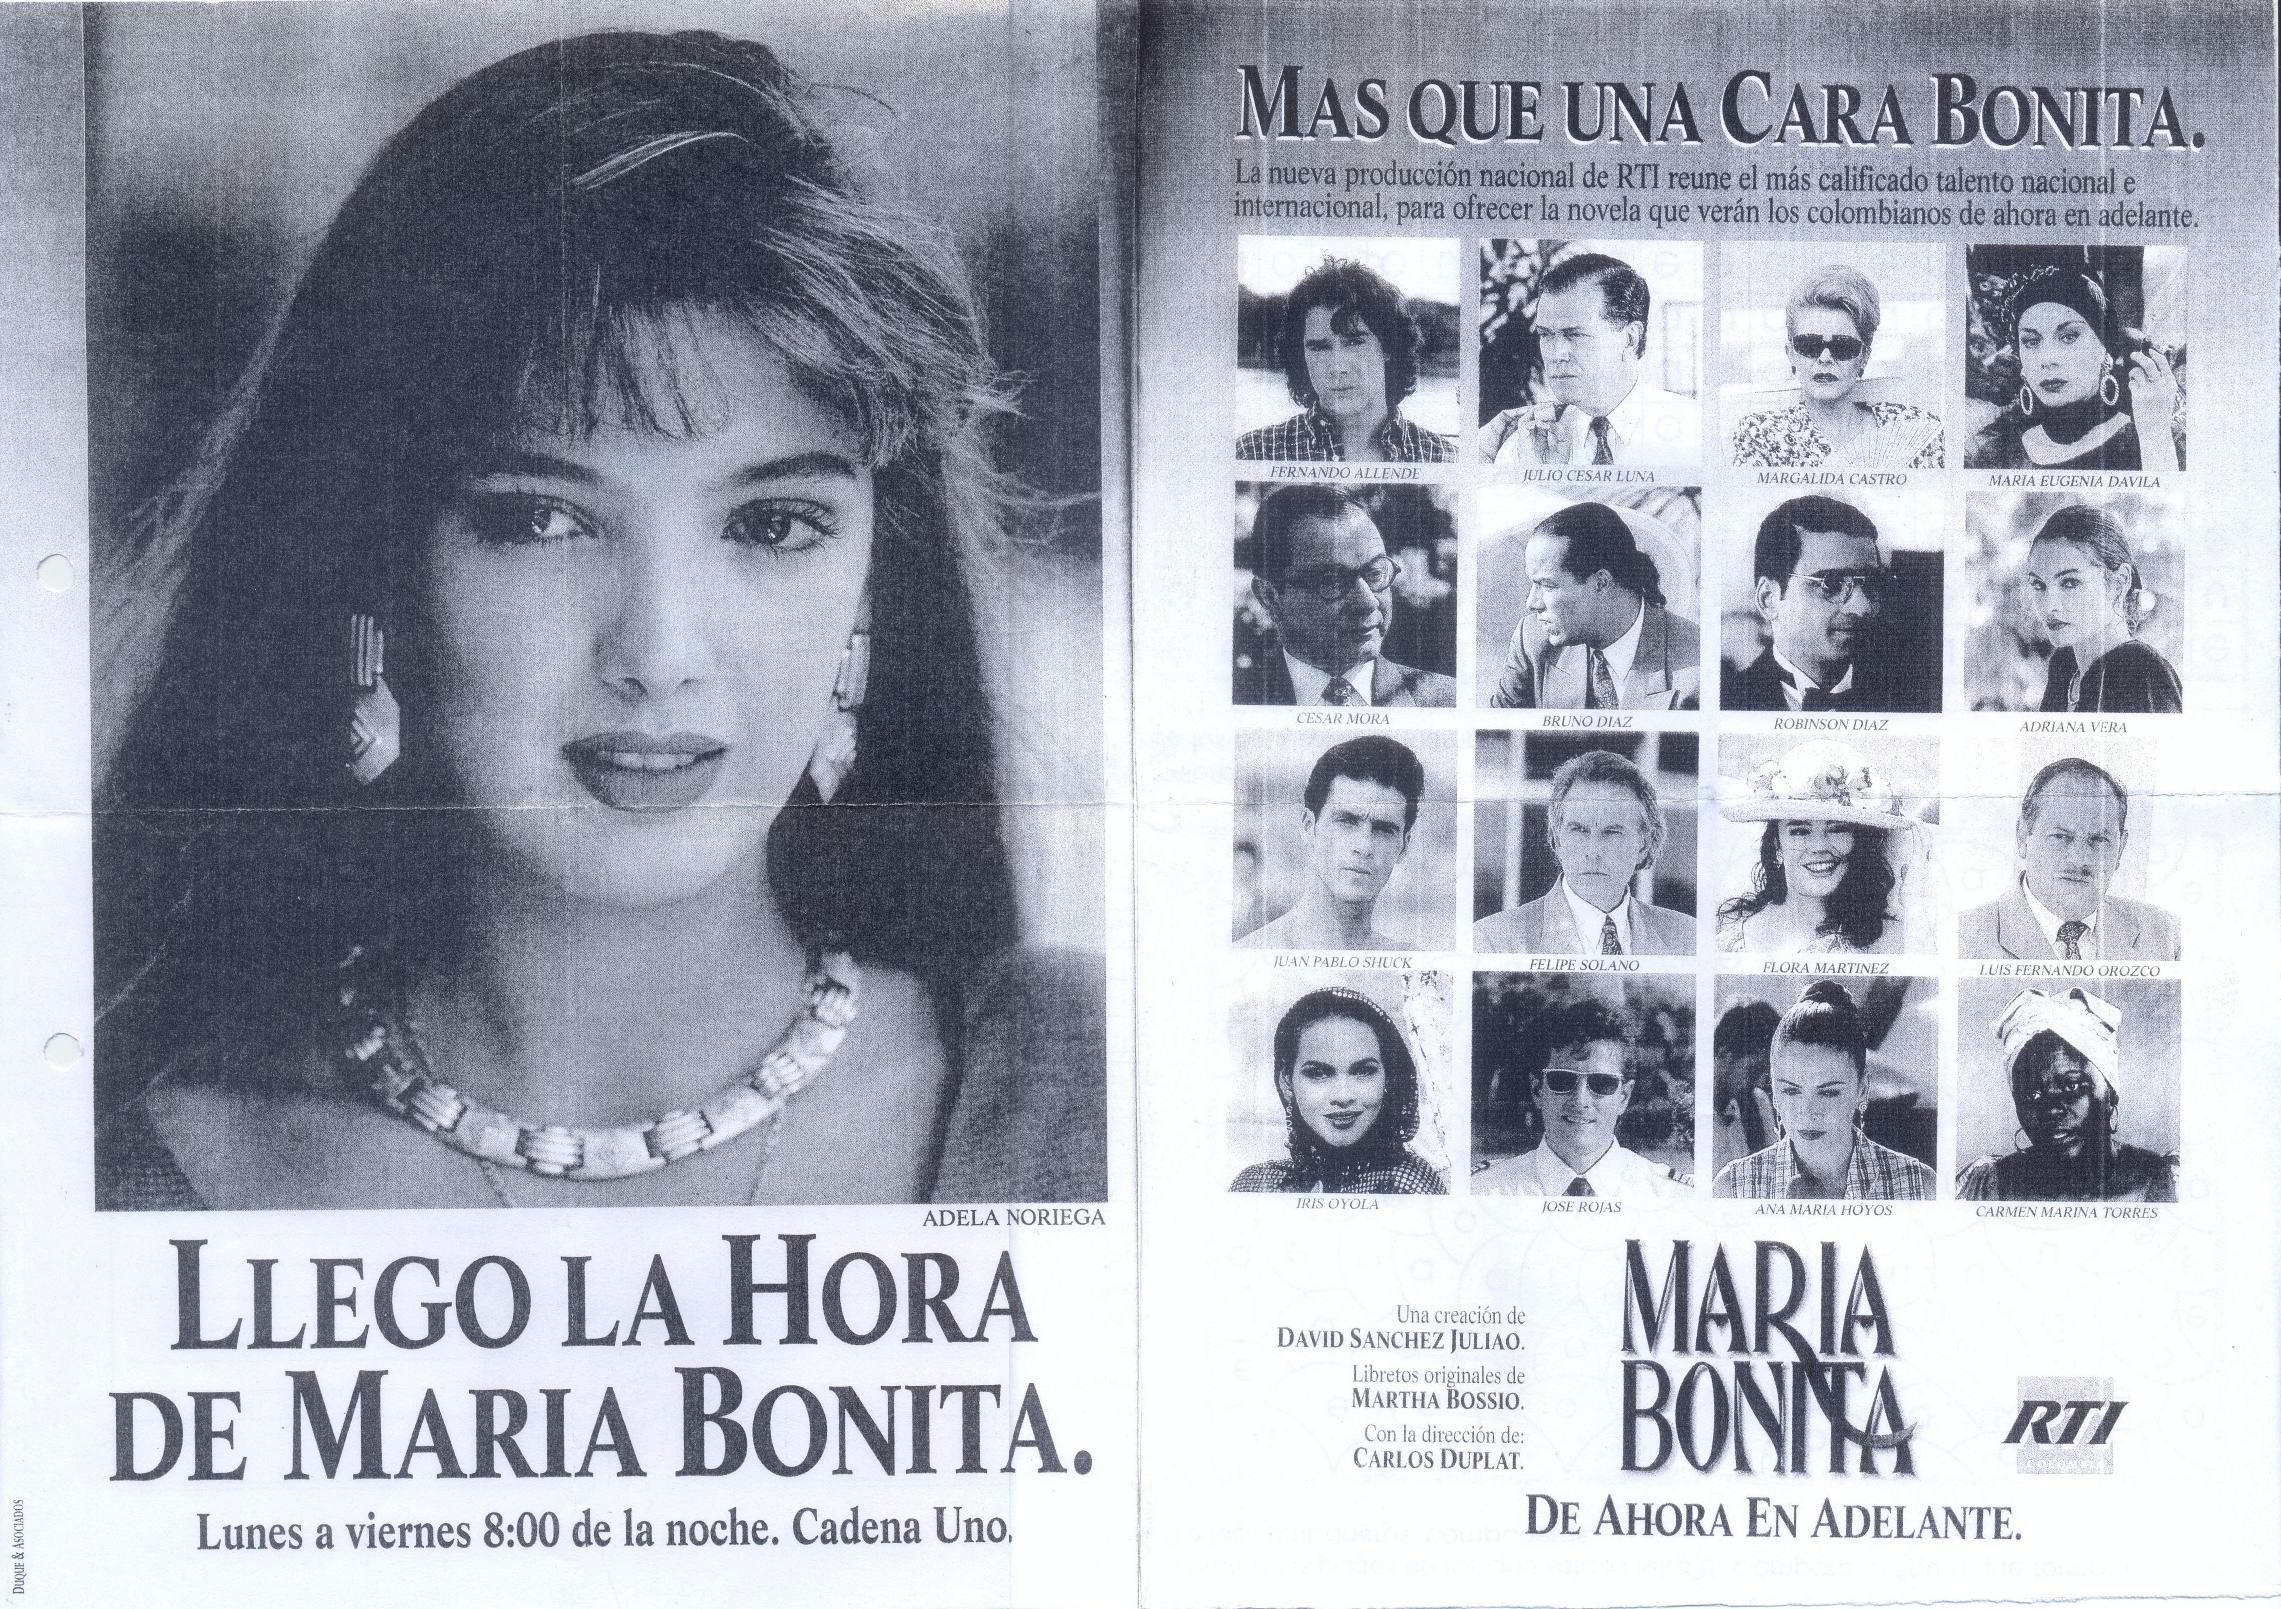 Maria Bonita Rti Television 1 1995 Fotocopia Cara Bonita Caras Bonita